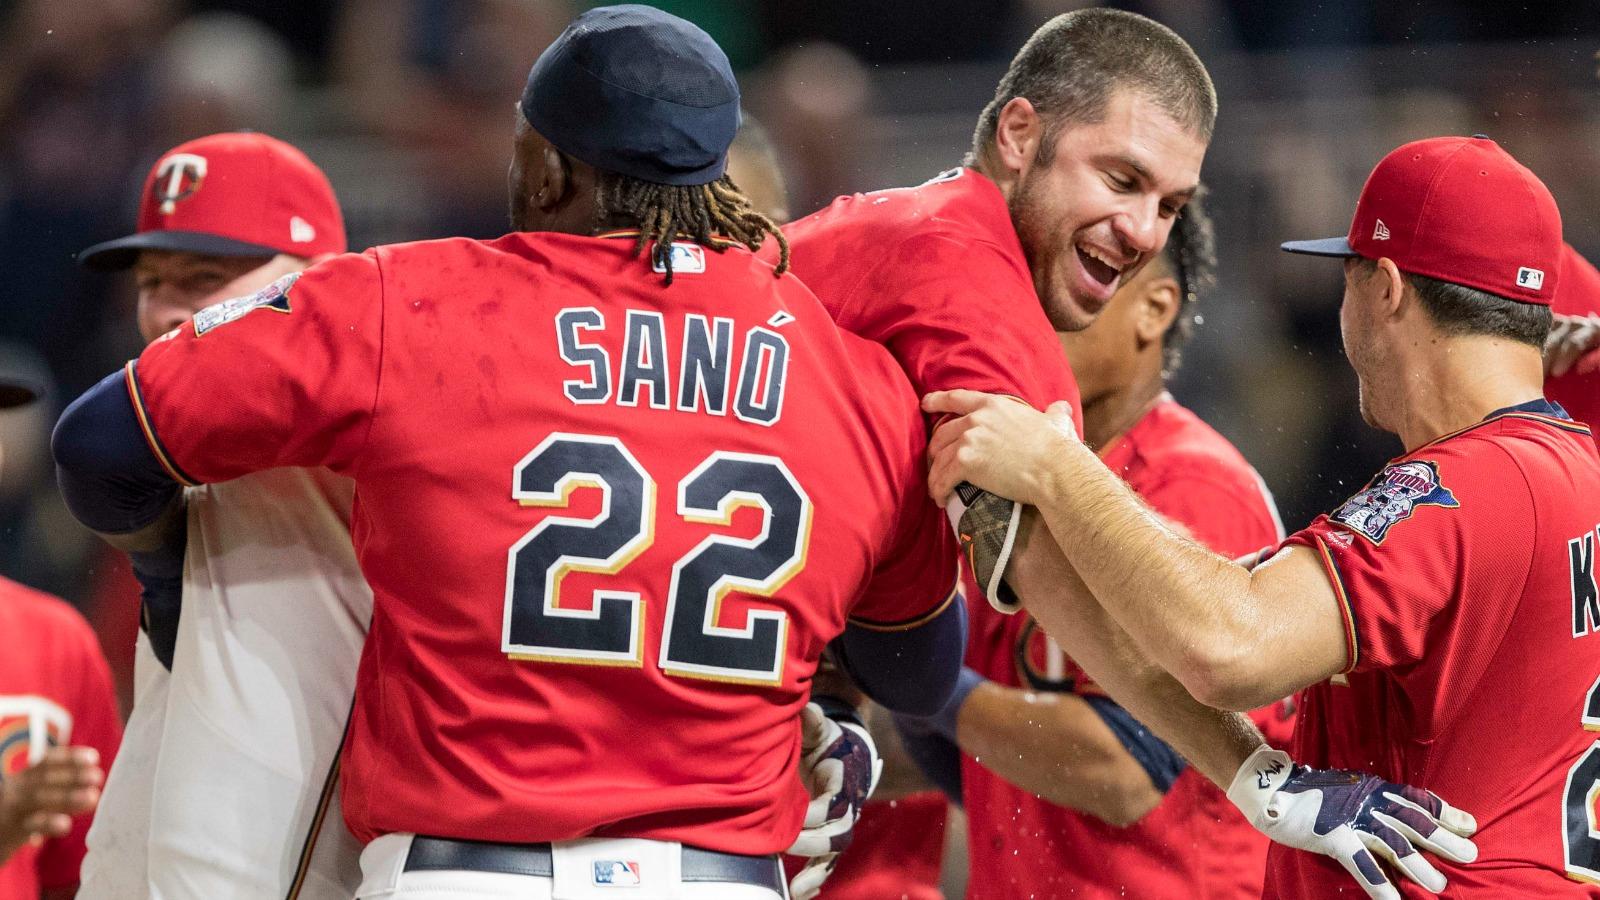 052617-MLB-Twins-PI